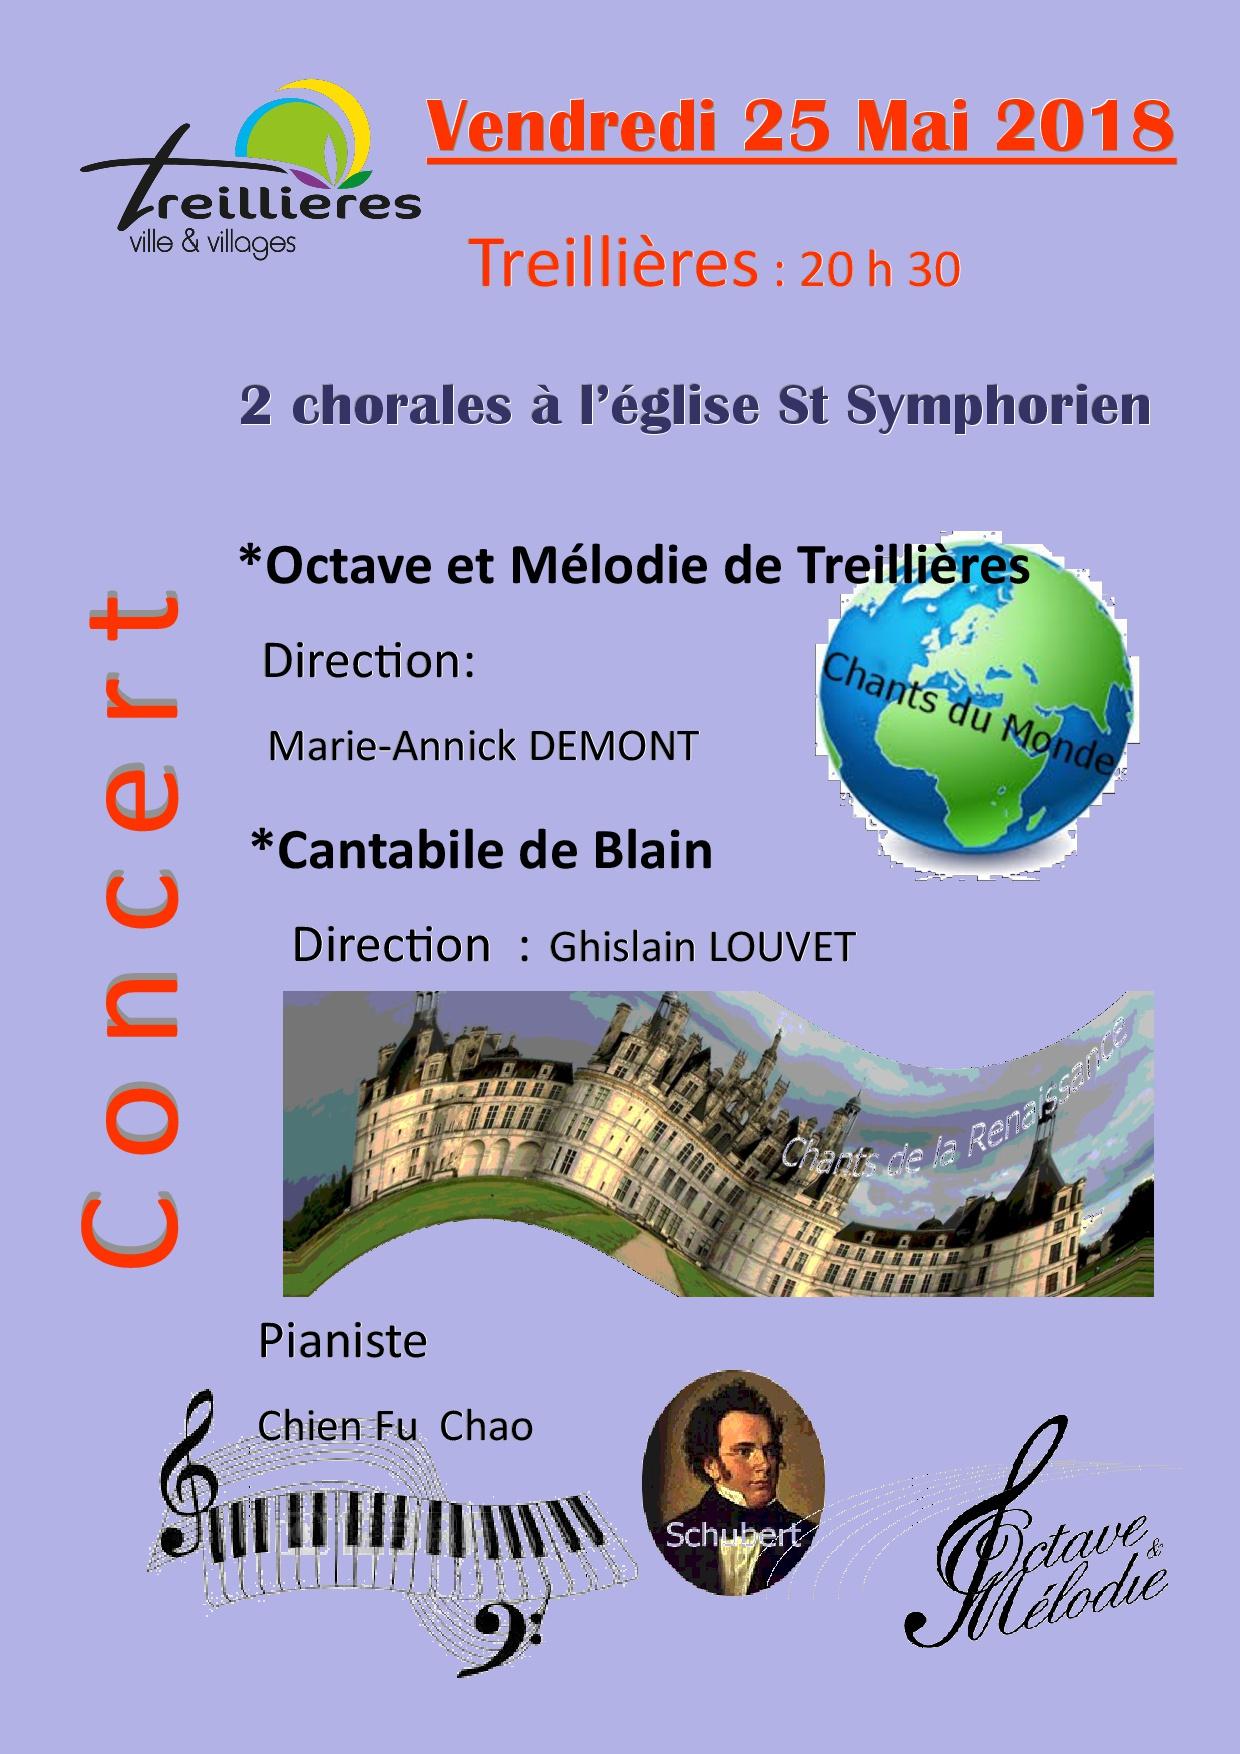 Affiche du concert diffusion internet a treill2018